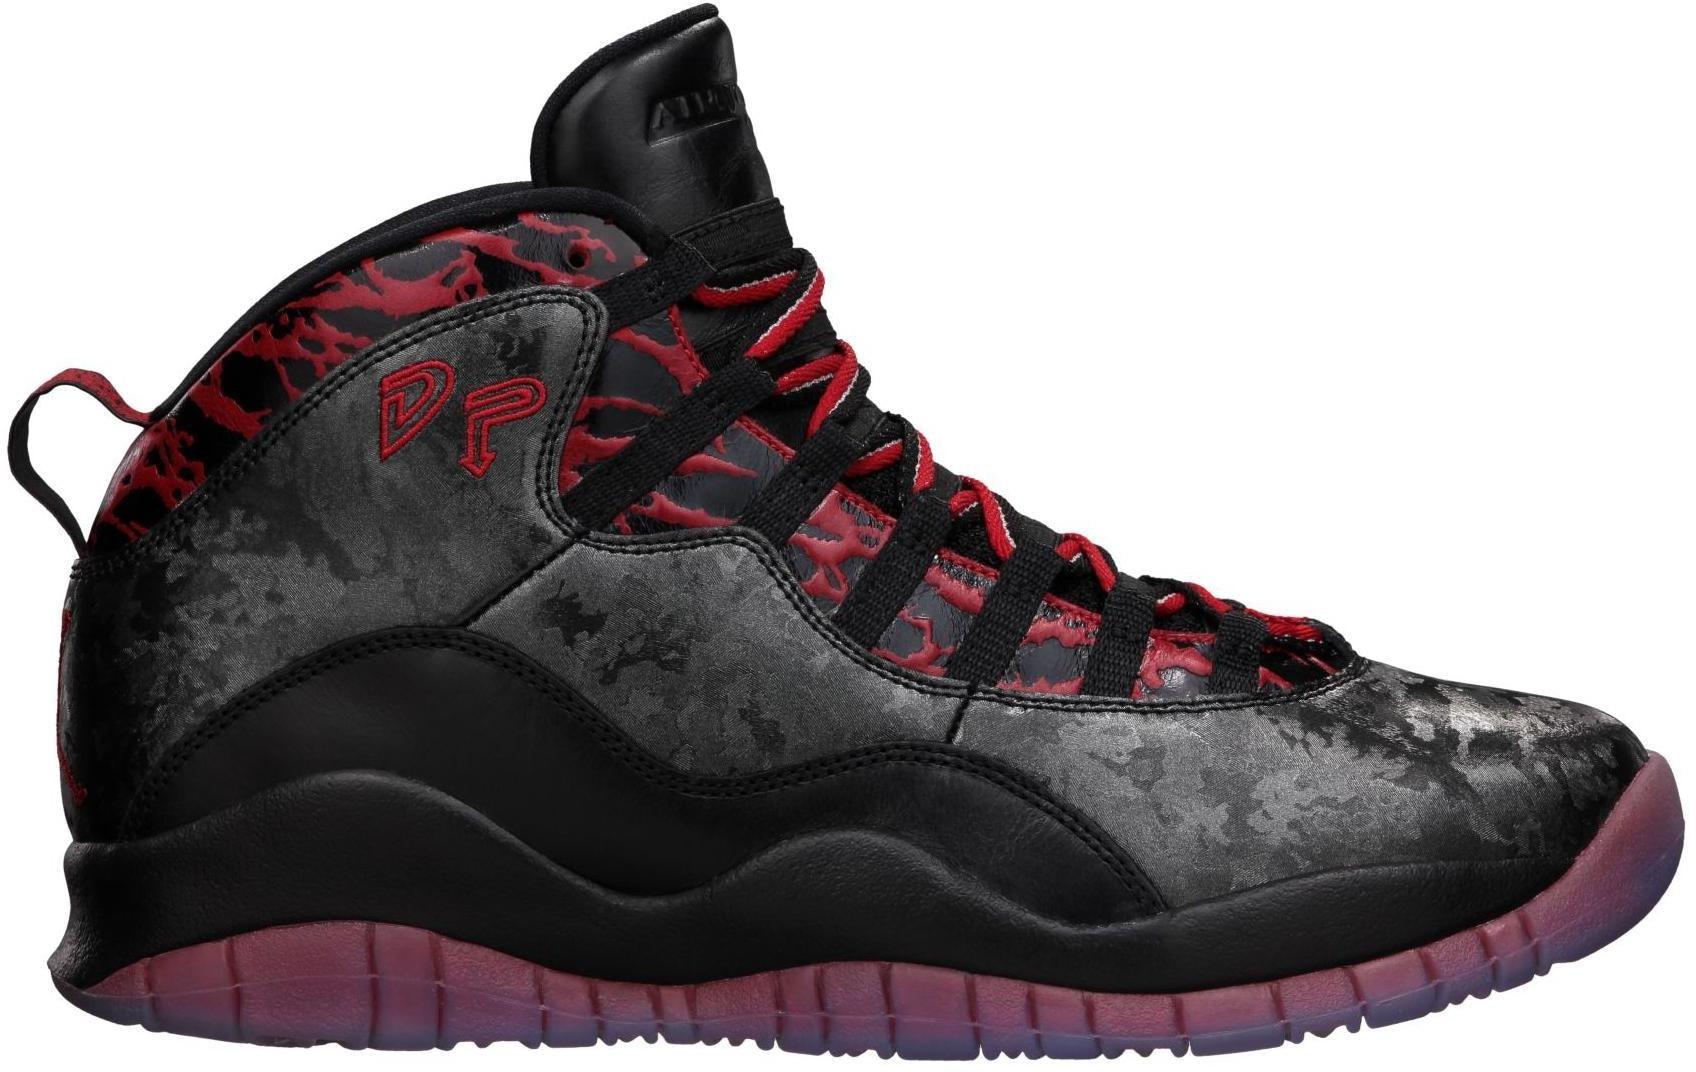 9de087abdf3a 2015 Online Nike Air Jordan 10 Fusion Red Black Laser Orange ...